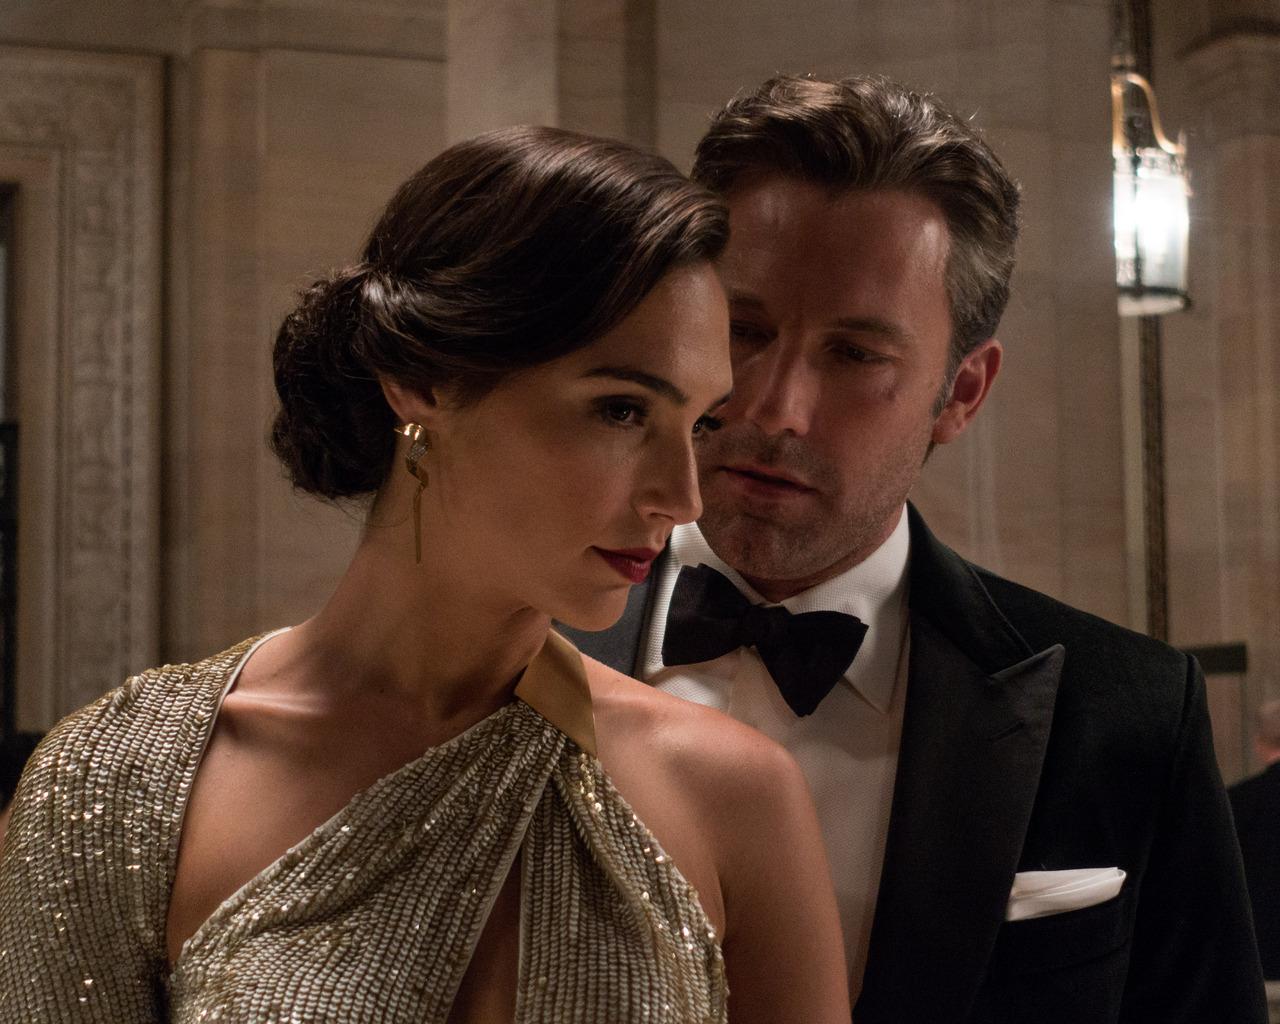 1280x1024 Wonder Woman Movie 1280x1024 Resolution Hd 4k: 1280x1024 Gal Gadot And Ben Affleck In Batman V Superman